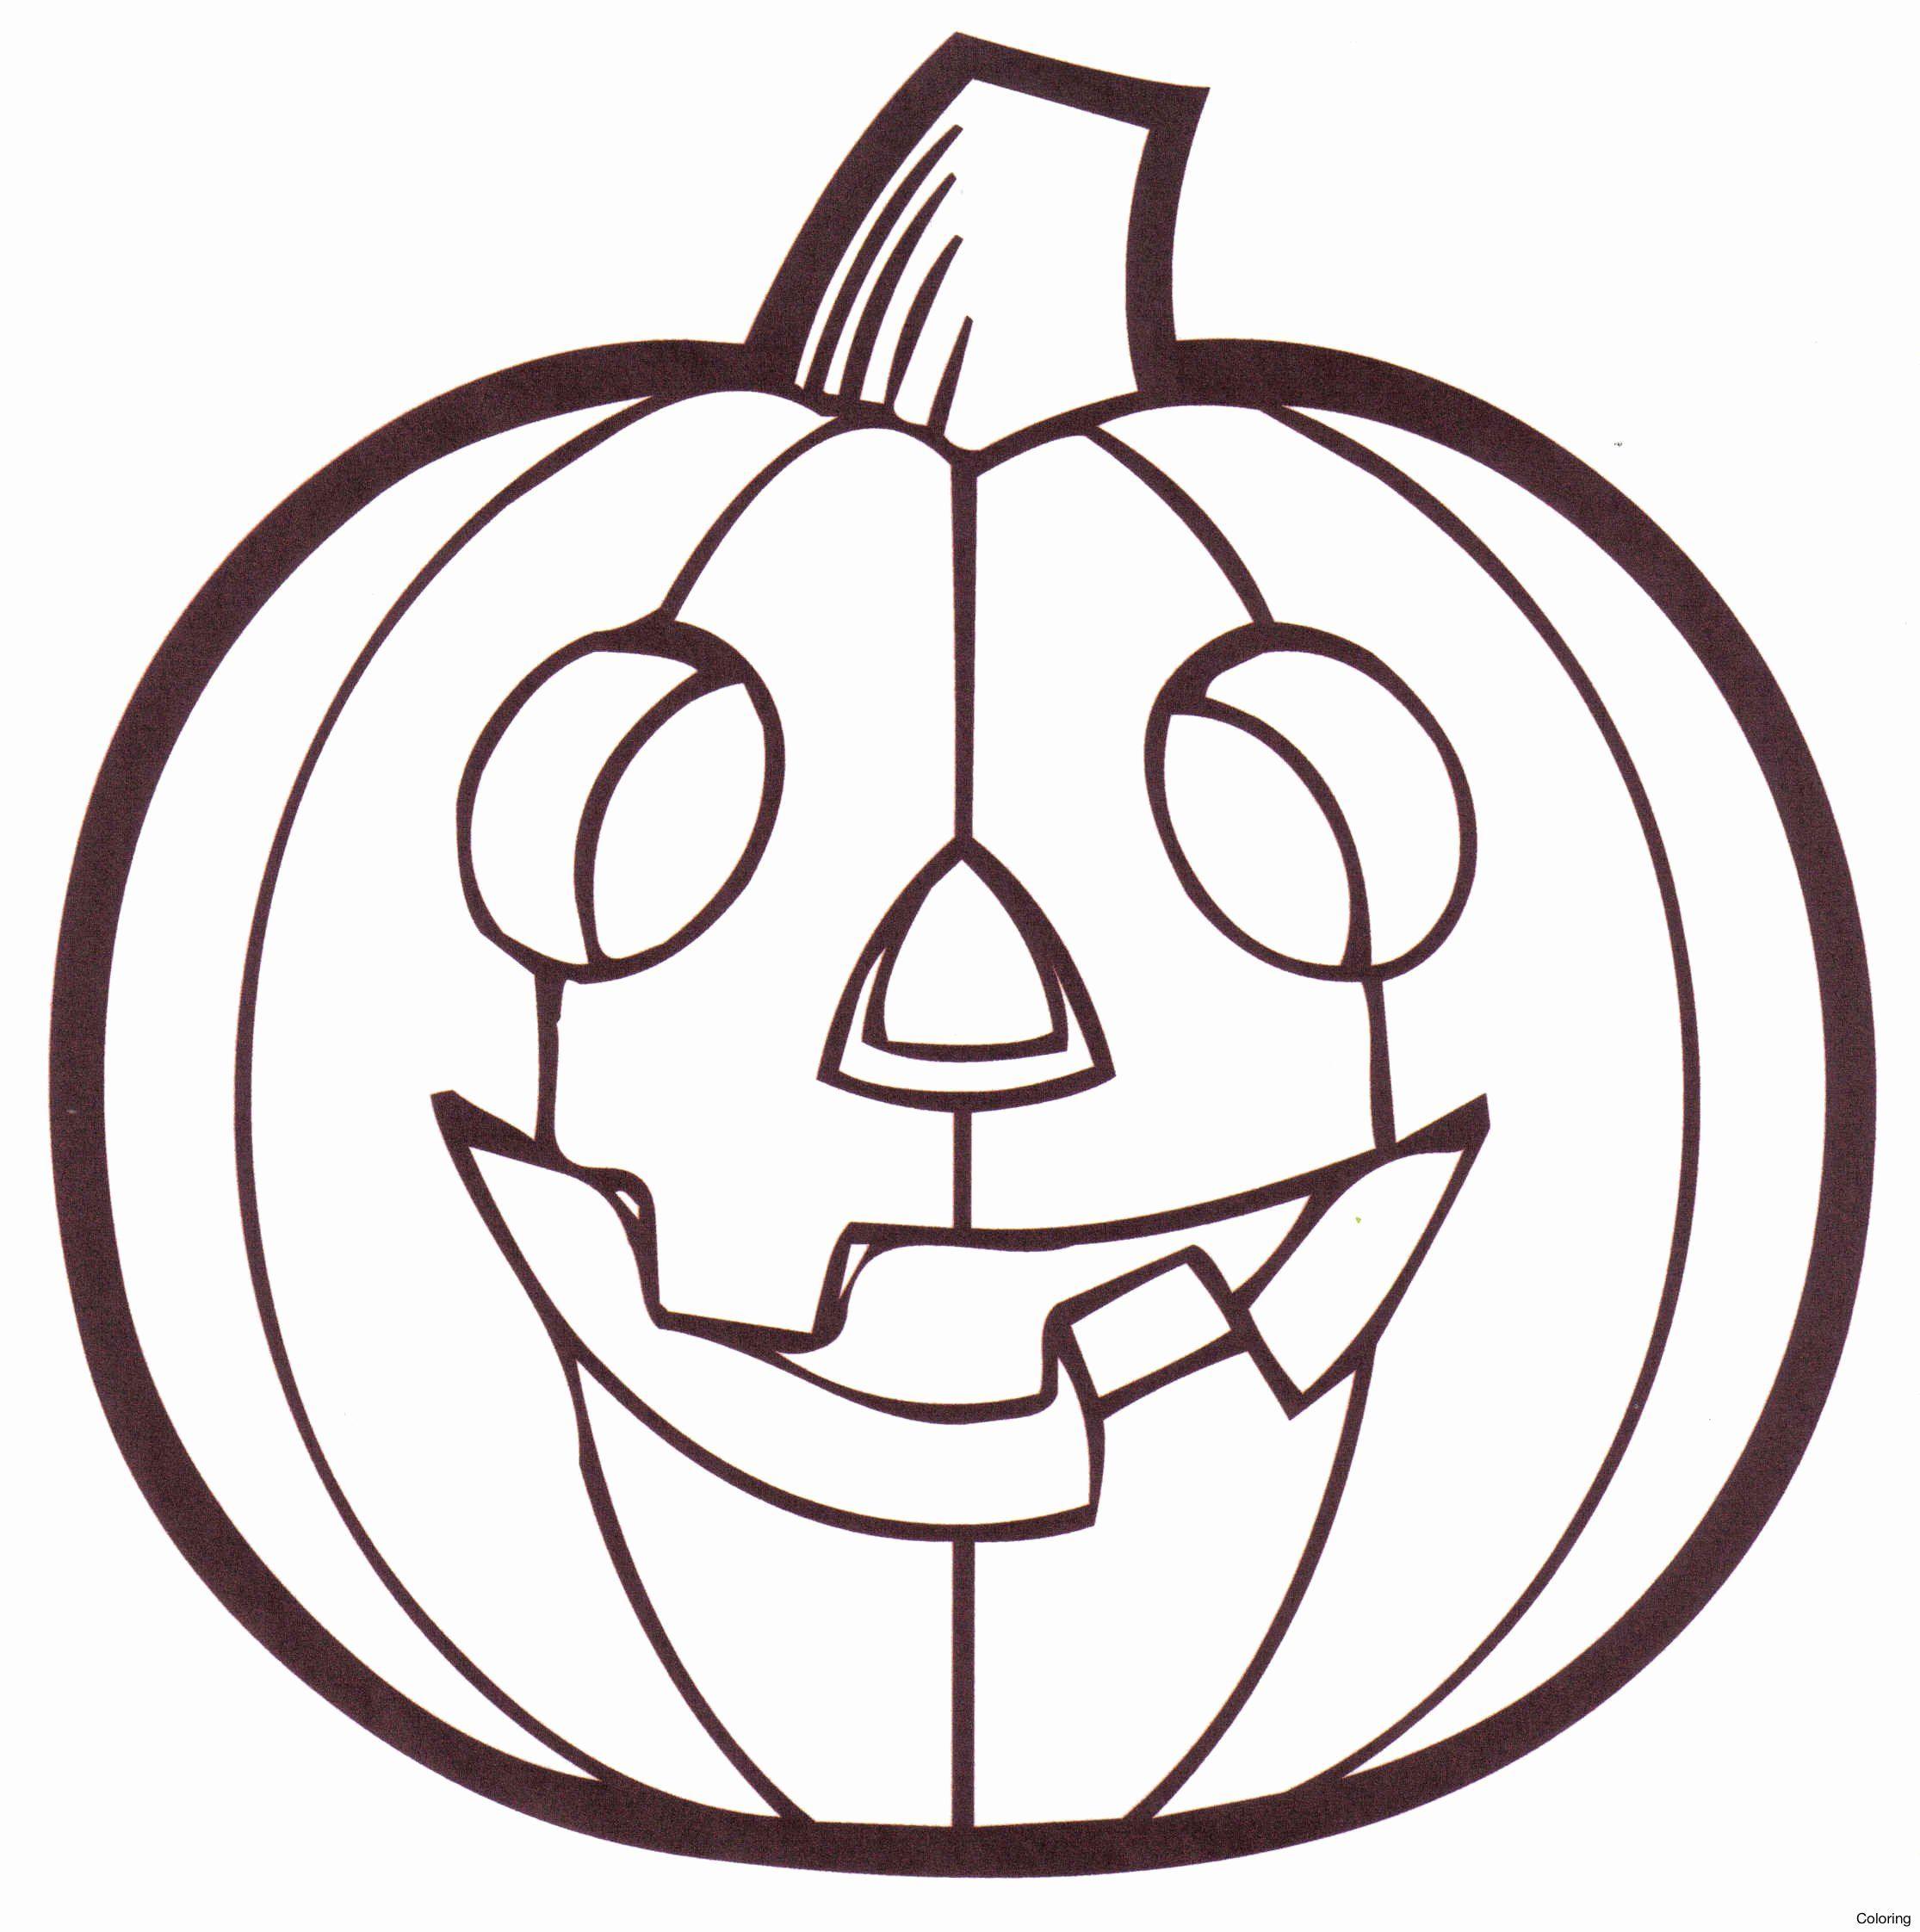 Pumpkin Coloring Pages For Kindergarten Lovely Jack O Lanterns Drawing At Getdrawings Pumpkin Coloring Pages Halloween Coloring Sheets Pumpkin Coloring Sheet